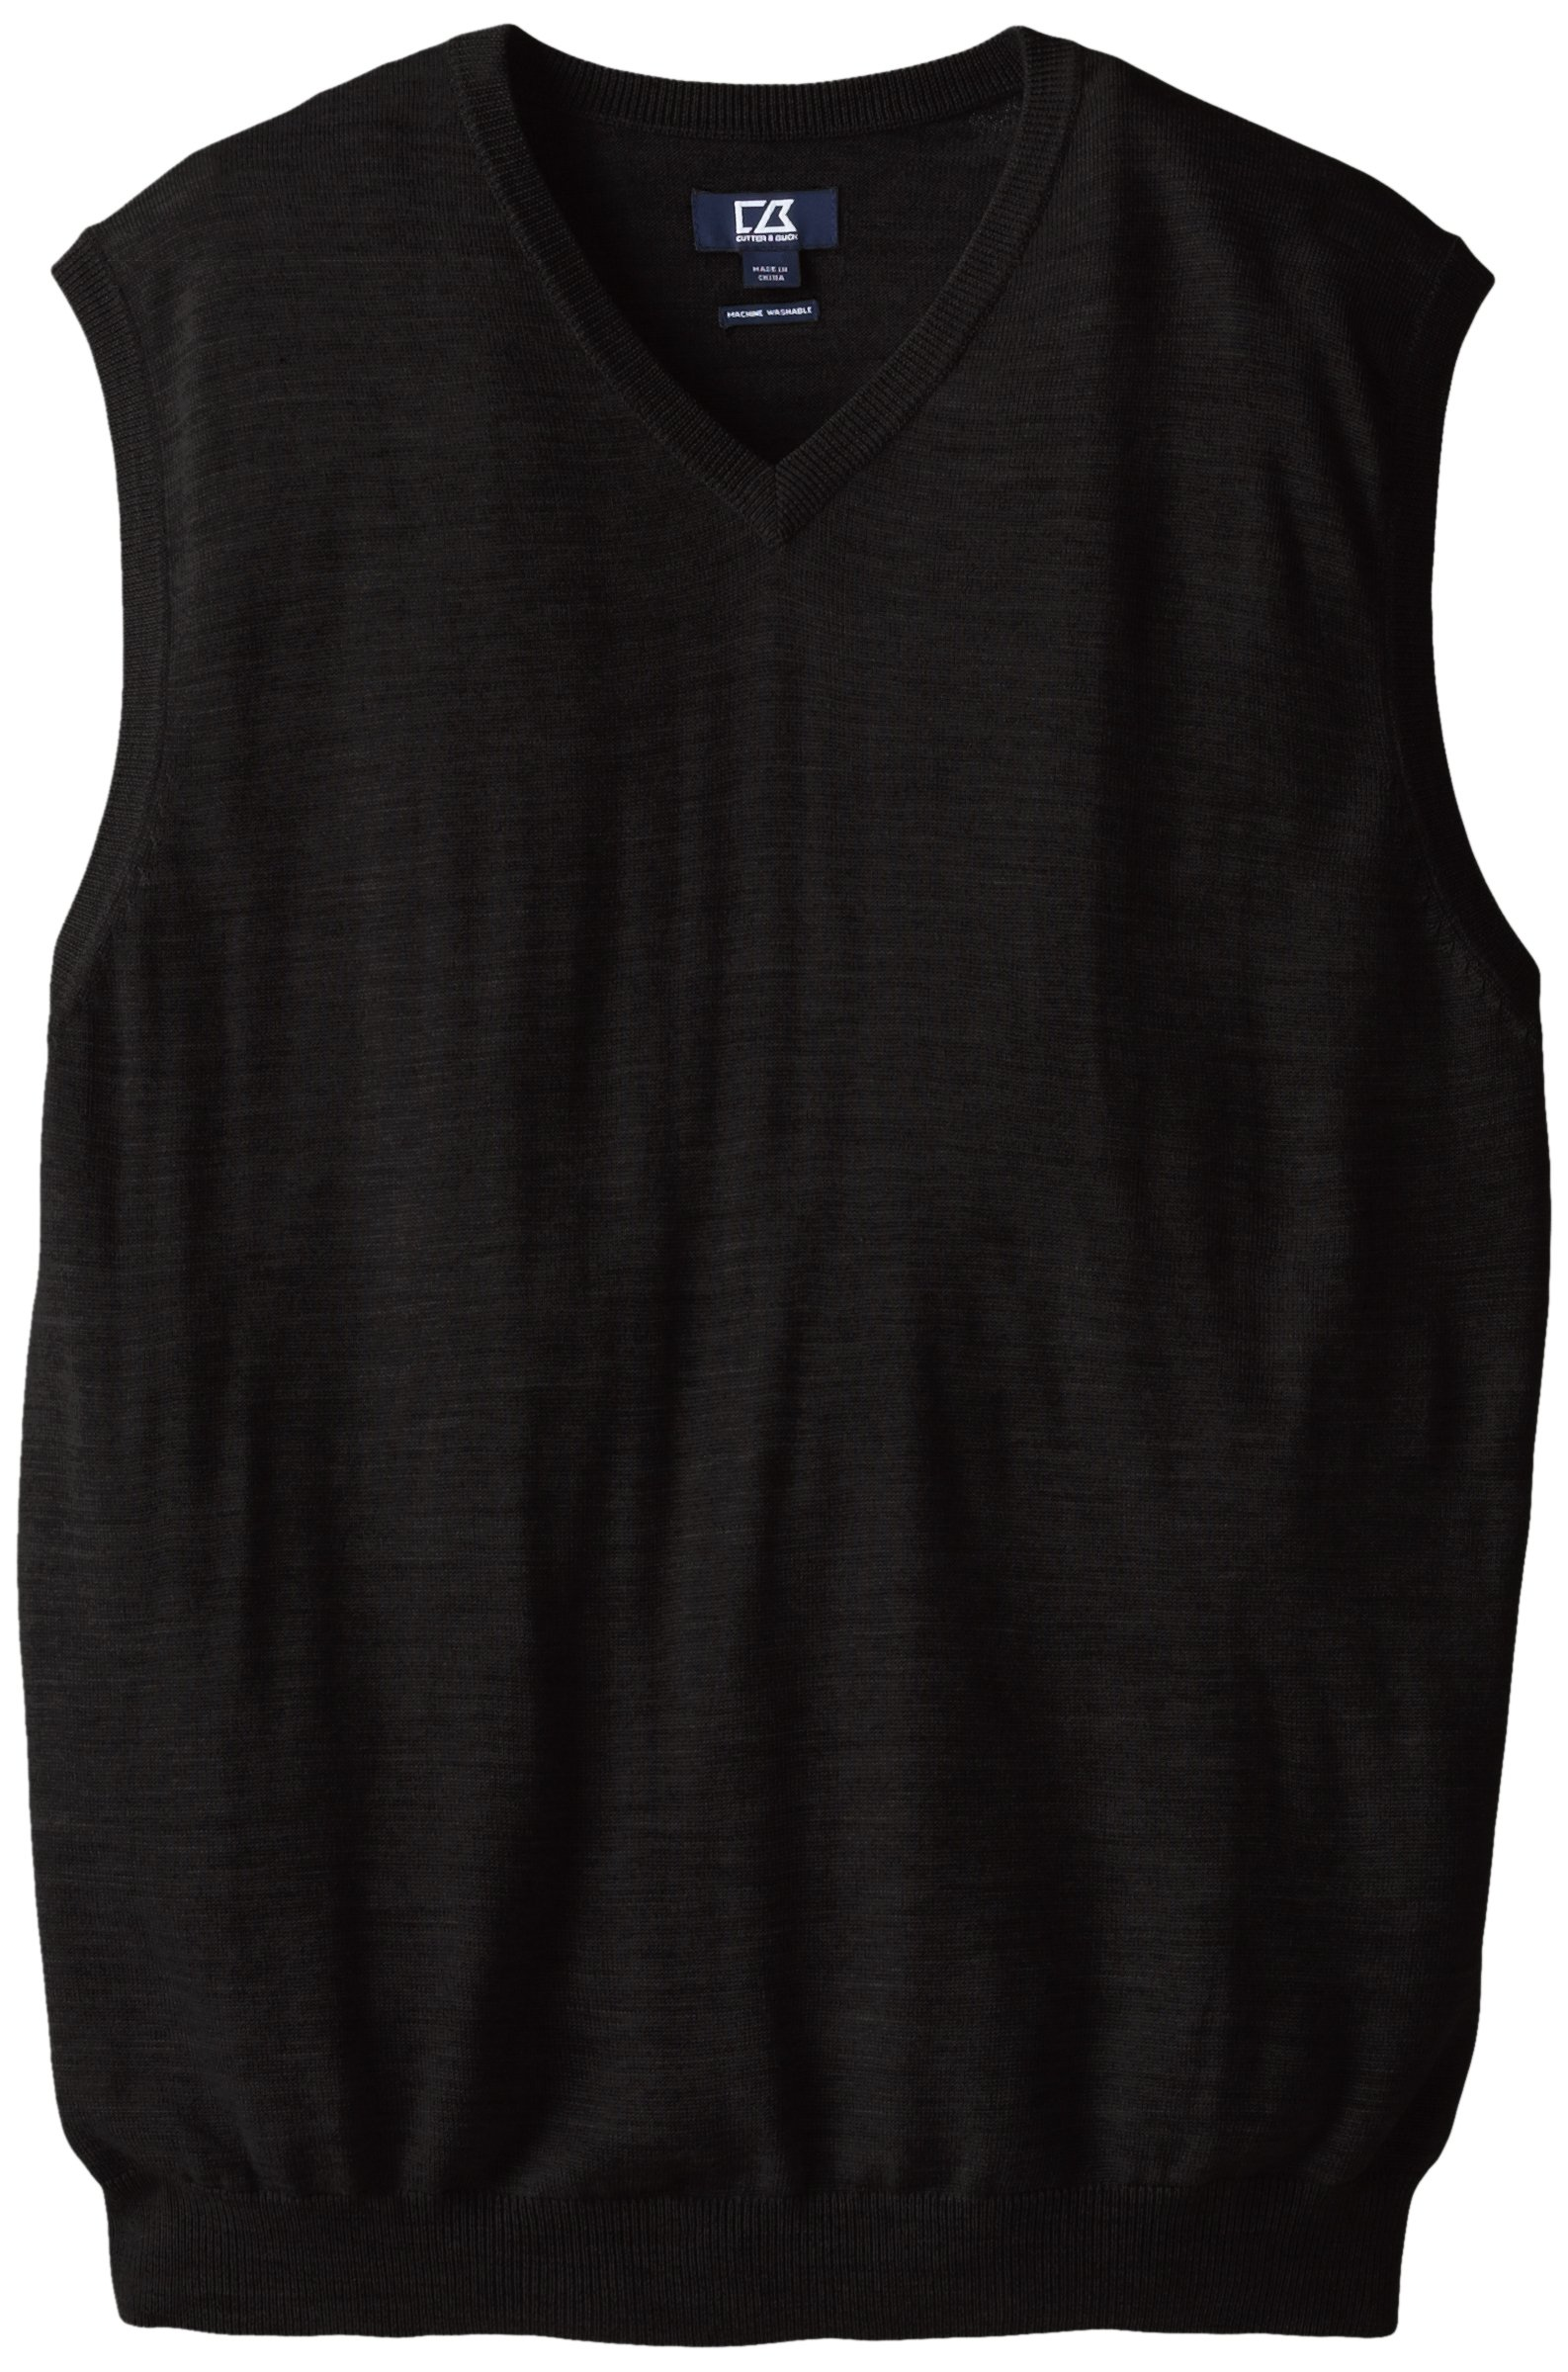 Cutter & Buck Men's Big-Tall Douglas V-Neck Sweater Vest, Black, 4X/Big